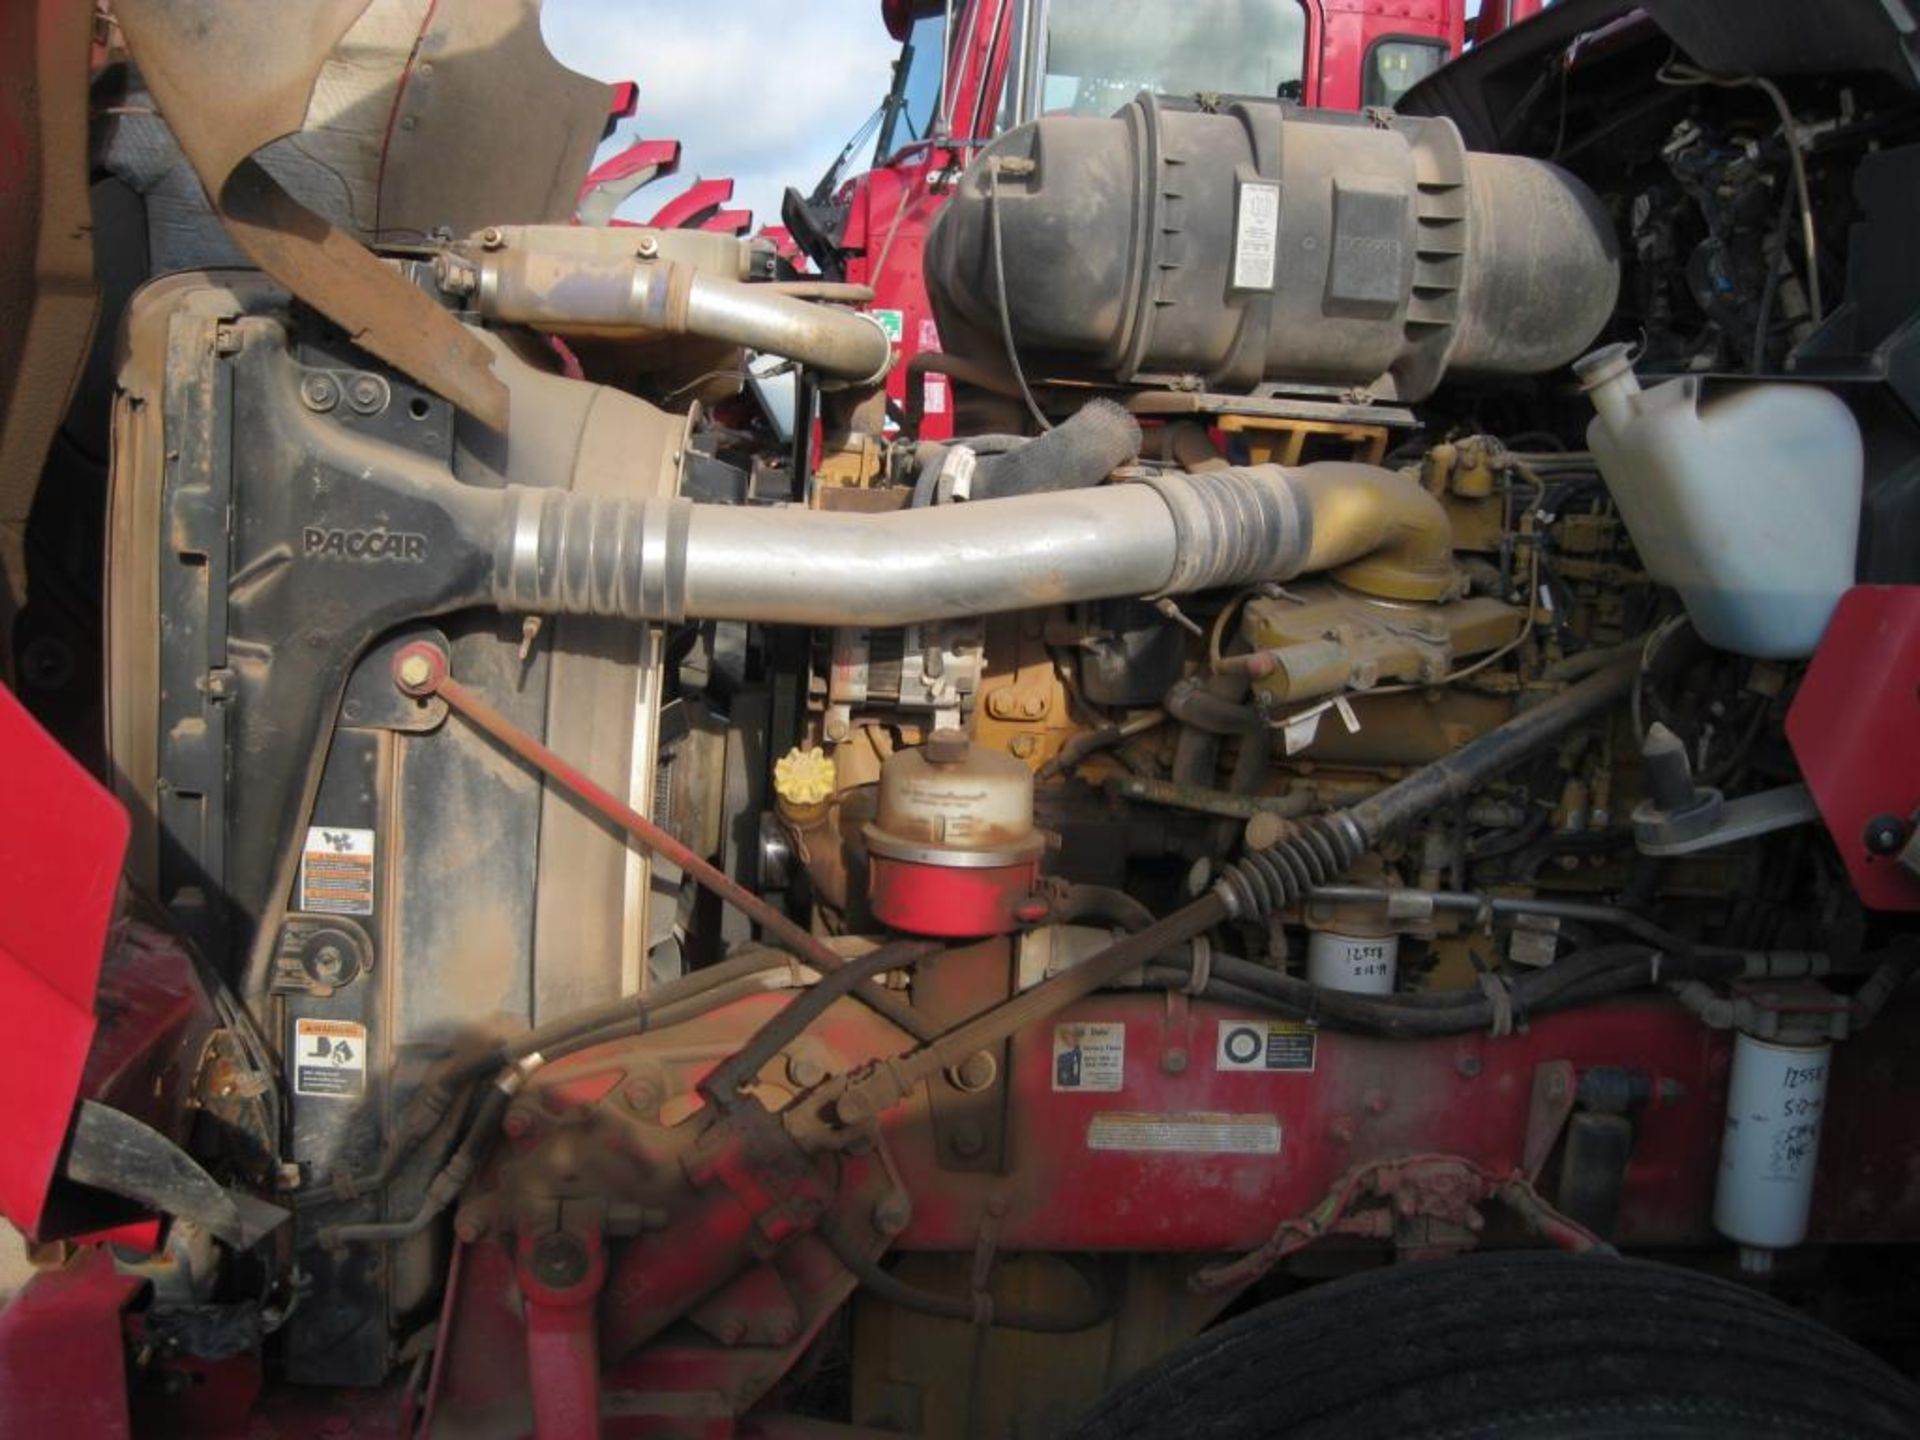 Kenworth Winch Truck - Image 21 of 22